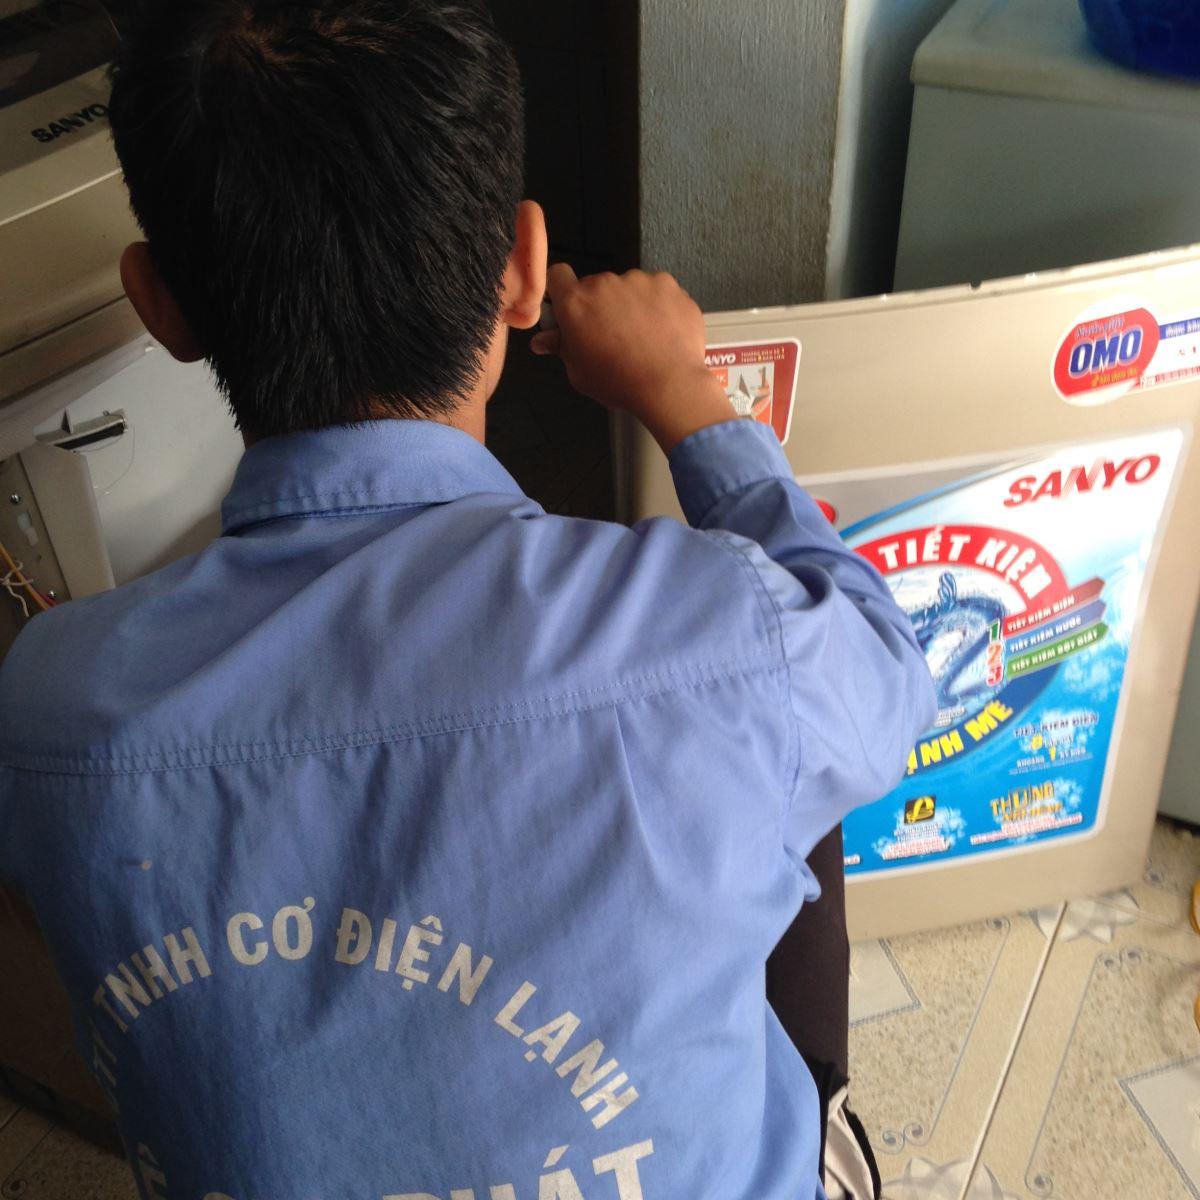 Cần bảo dưỡng máy giặt giá rẻ